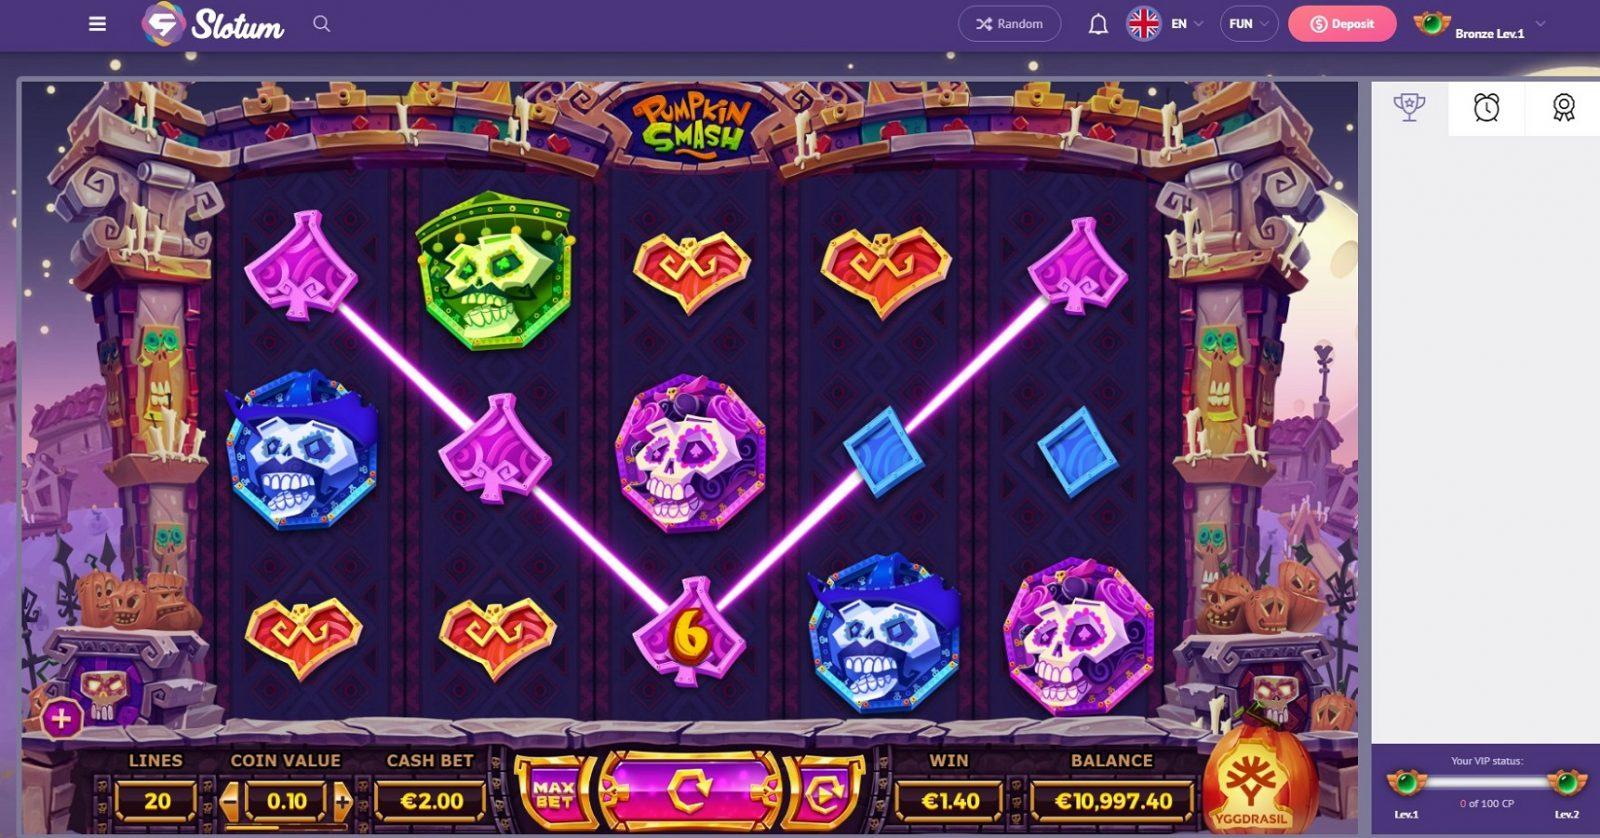 Slotum_casino_PumPkinSmash_game